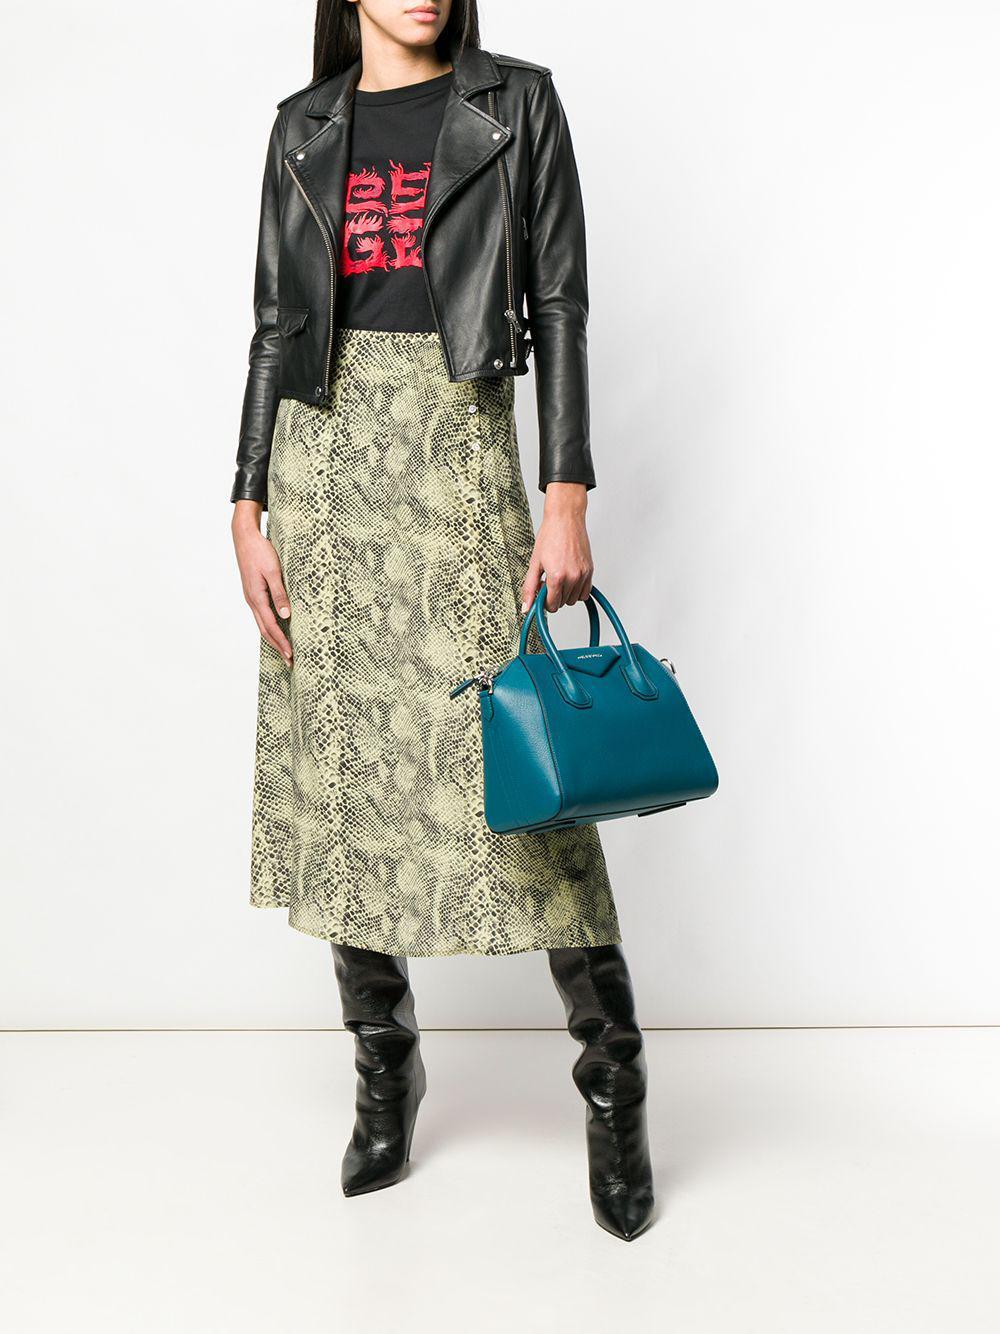 dc9634f8ab46 Lyst - Givenchy Antigona Small Leather Bag in Green